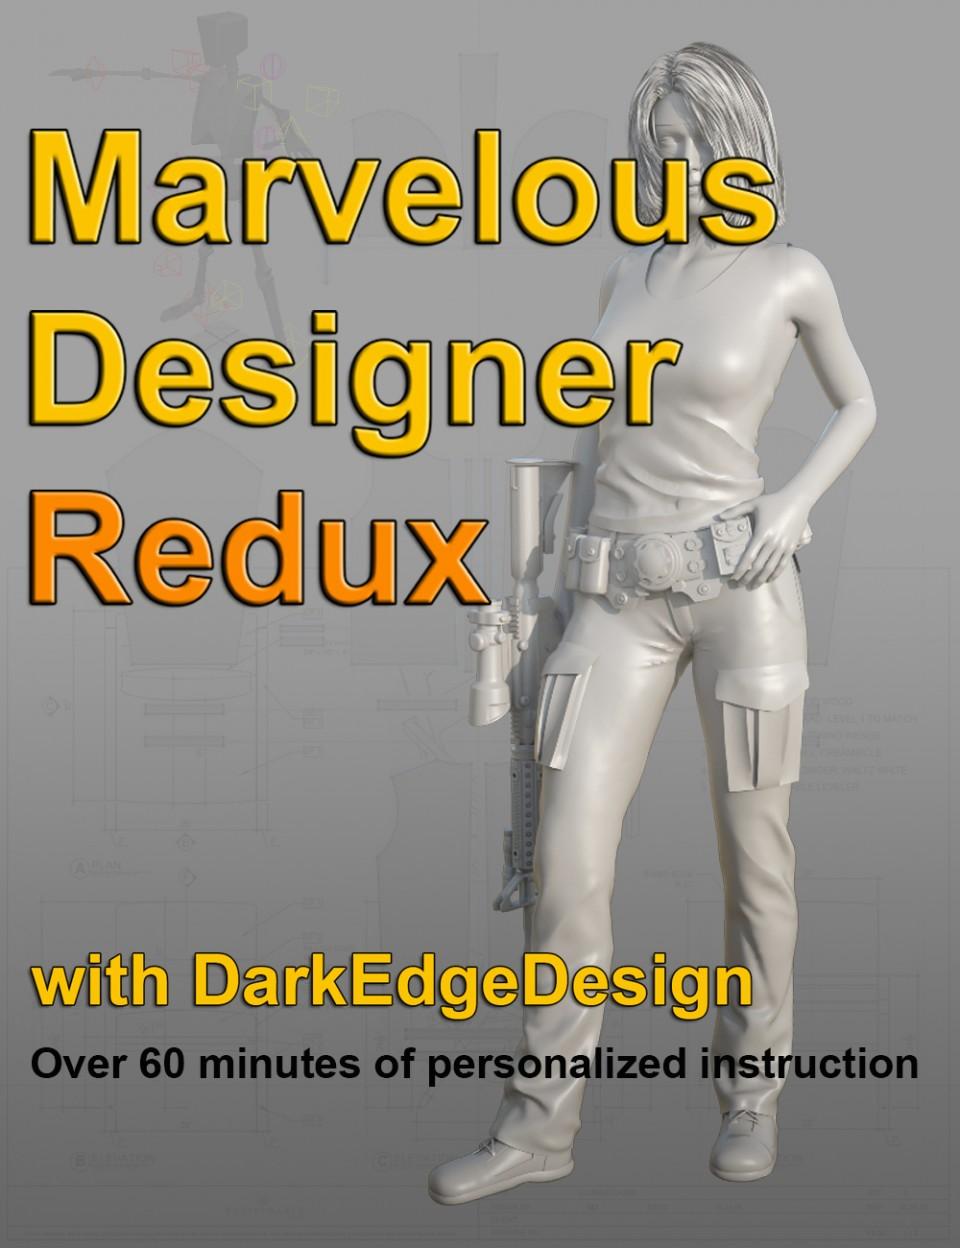 Marvelous Designer Redux Video Tutorial